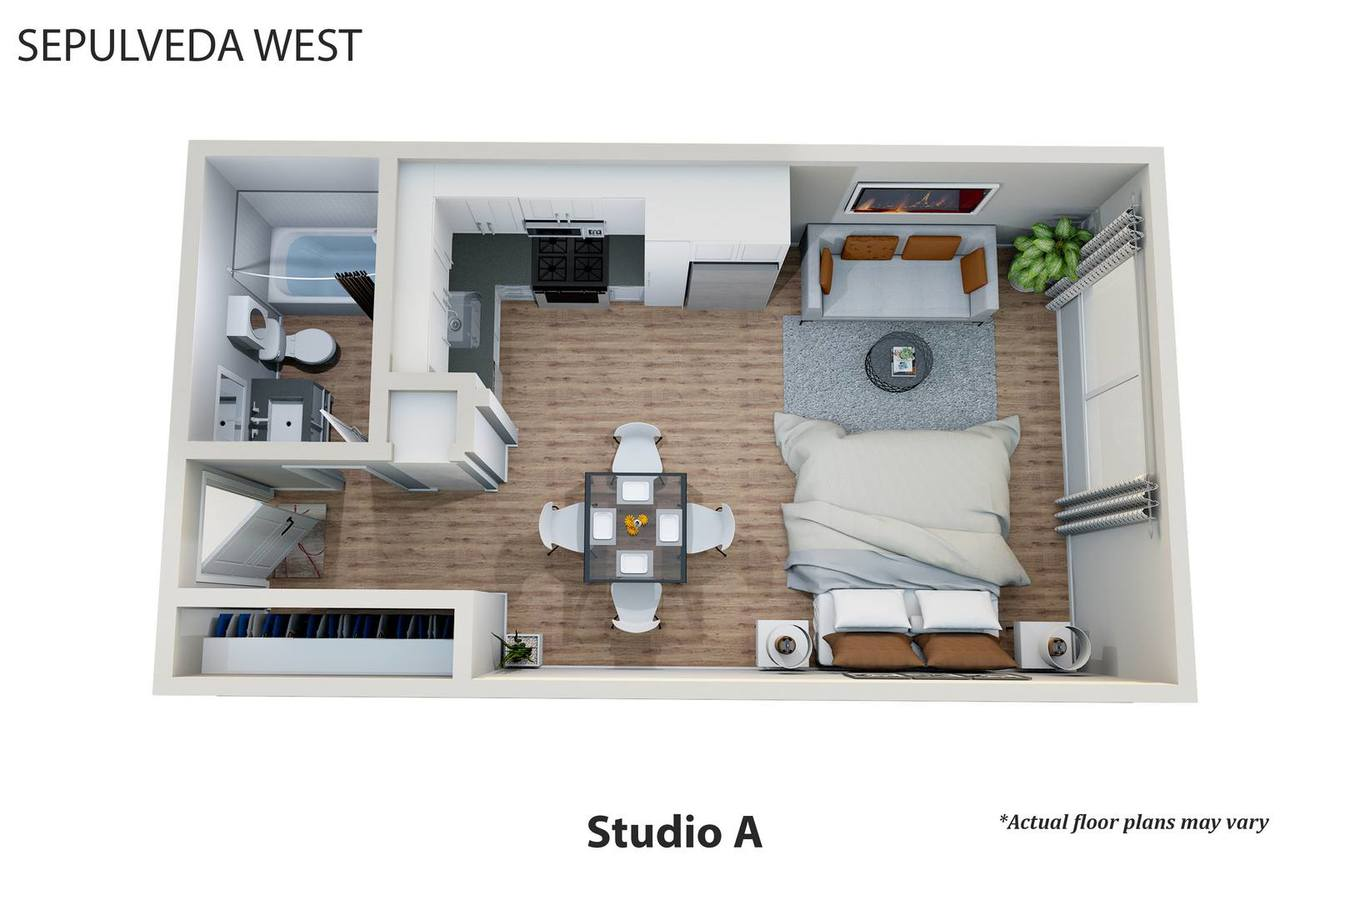 Studio 1 Bathroom Apartment for rent at Sepulveda West Apartments in Los Angeles, CA